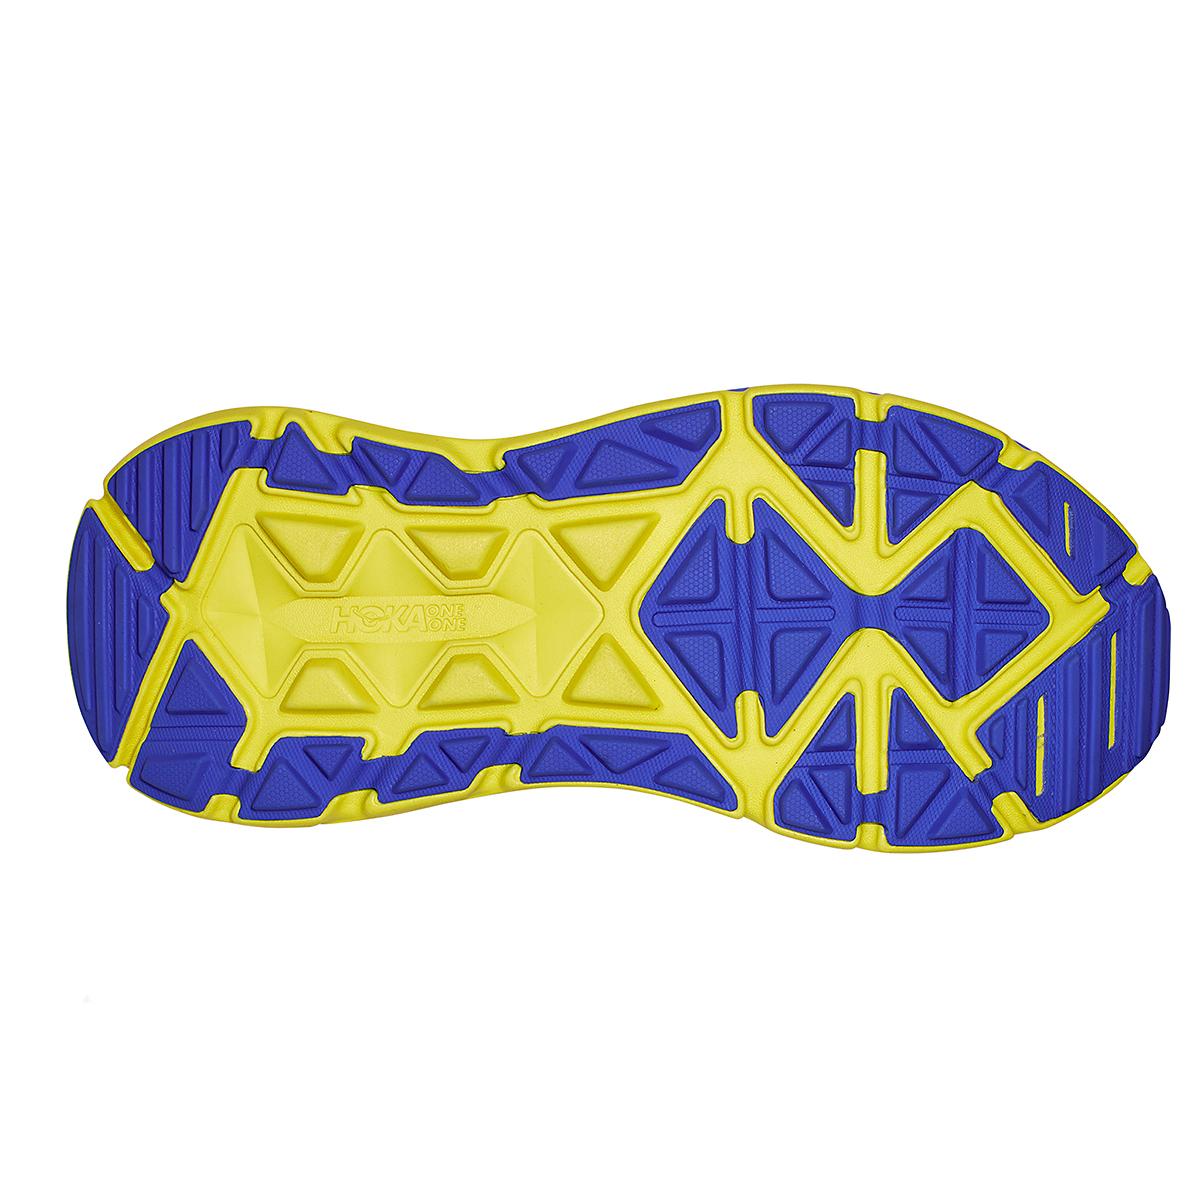 Men's Hoka One One Stinson Atr 6 Trail Running Shoe - Color: Black Iris/Evening Primrose - Size: 7 - Width: Regular, Black Iris/Evening Primrose, large, image 3